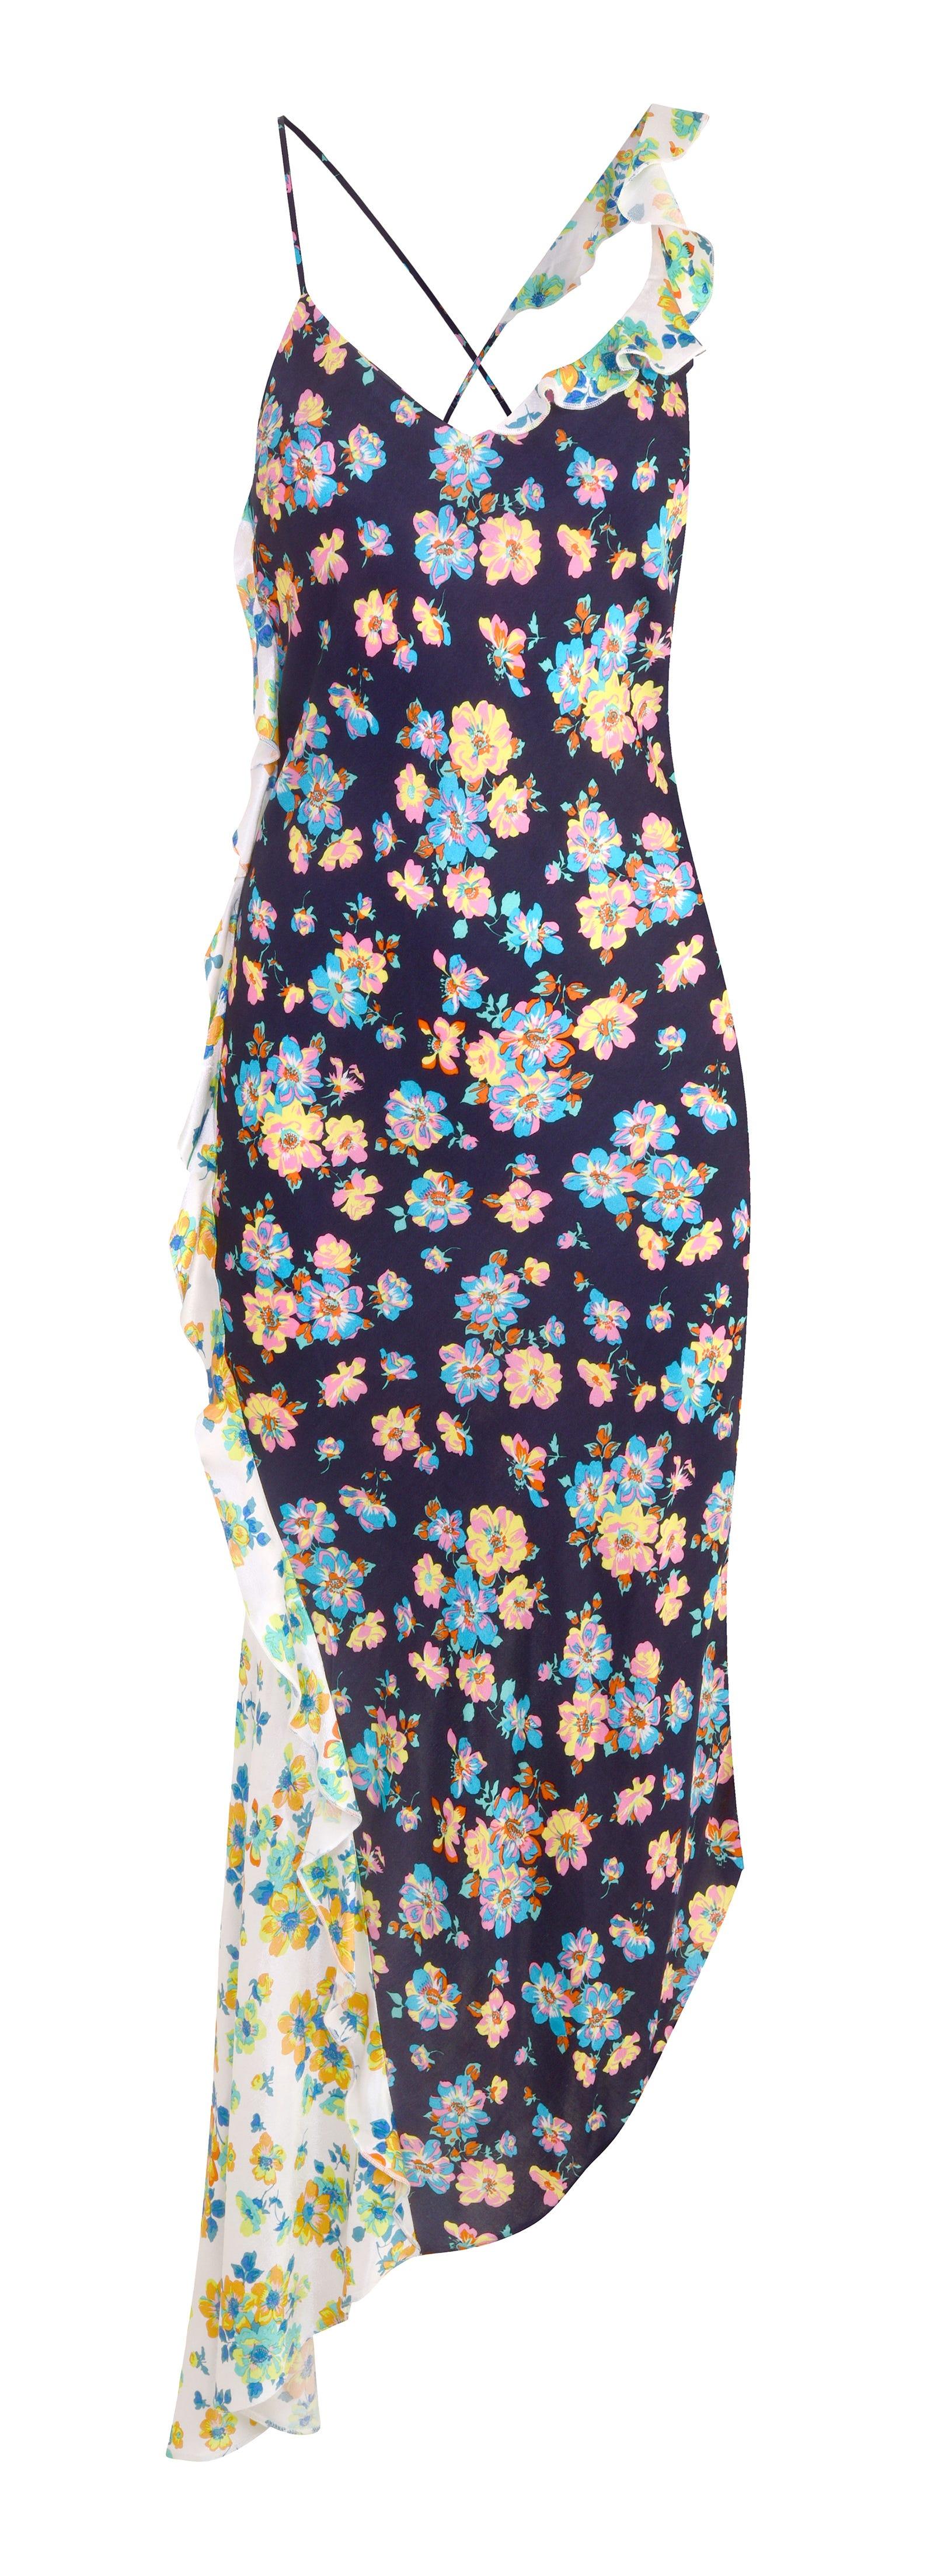 9981e36a1e Topshop Just Dropped 17 New Season Dresses